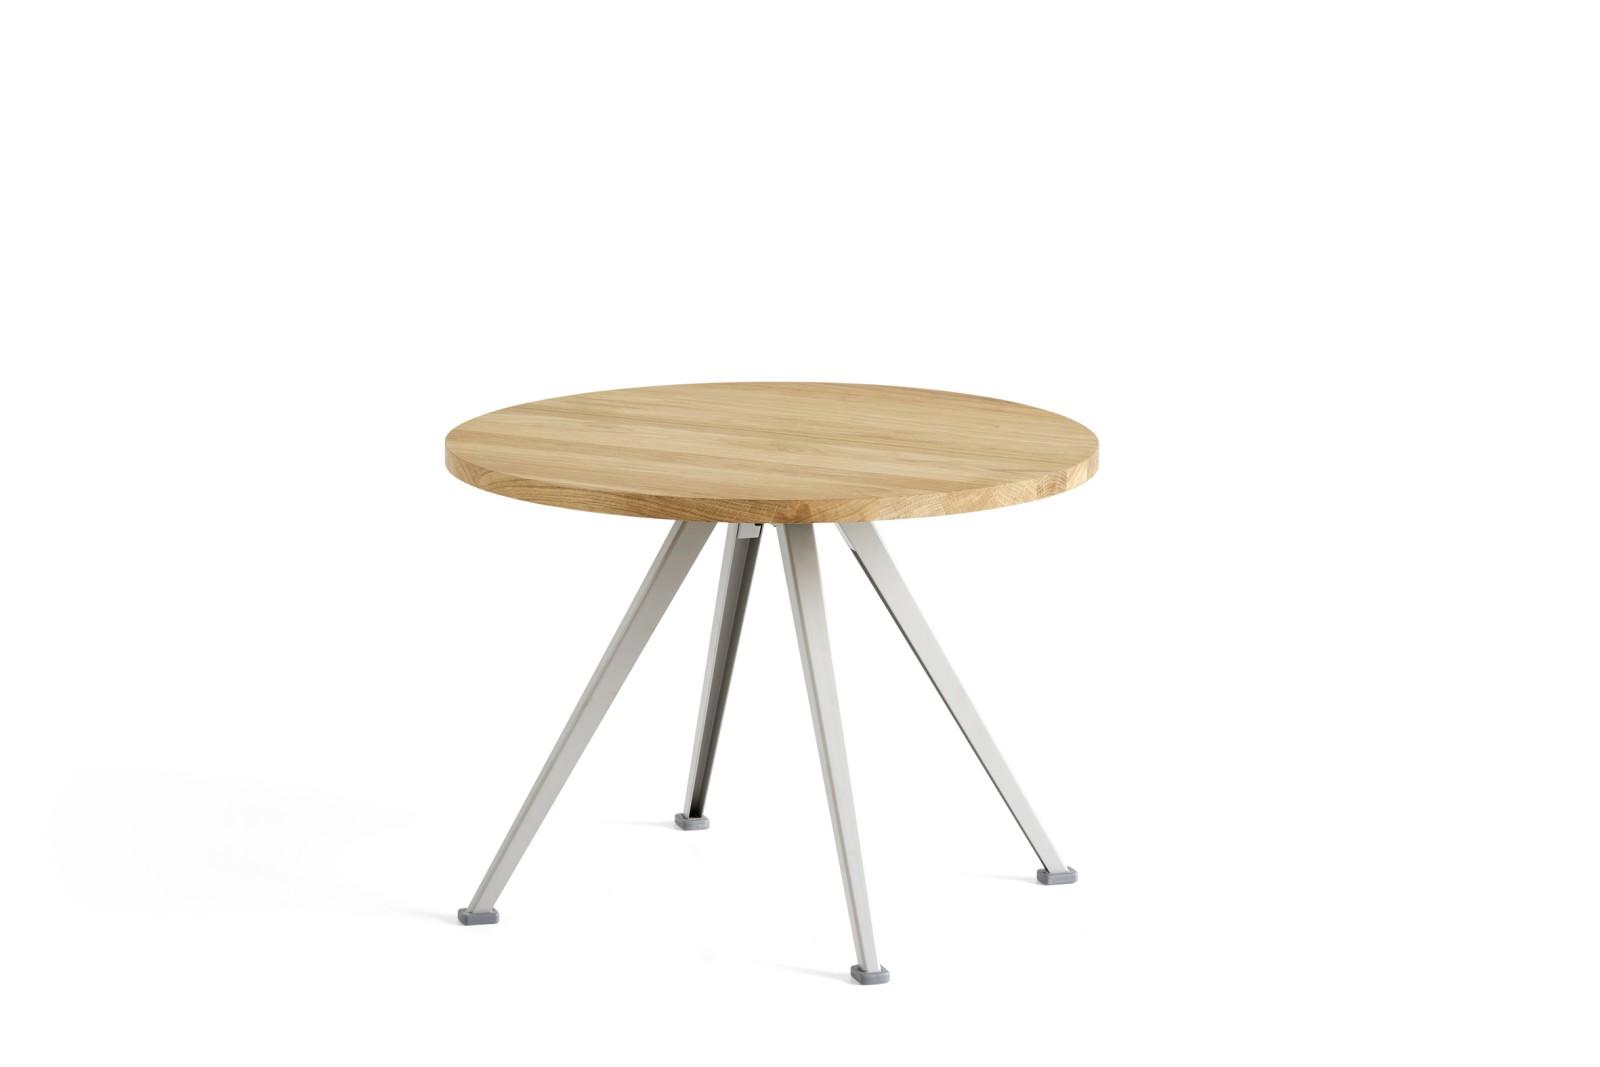 Pyramid Low Coffee Table 51 Oiled Oak, Beige